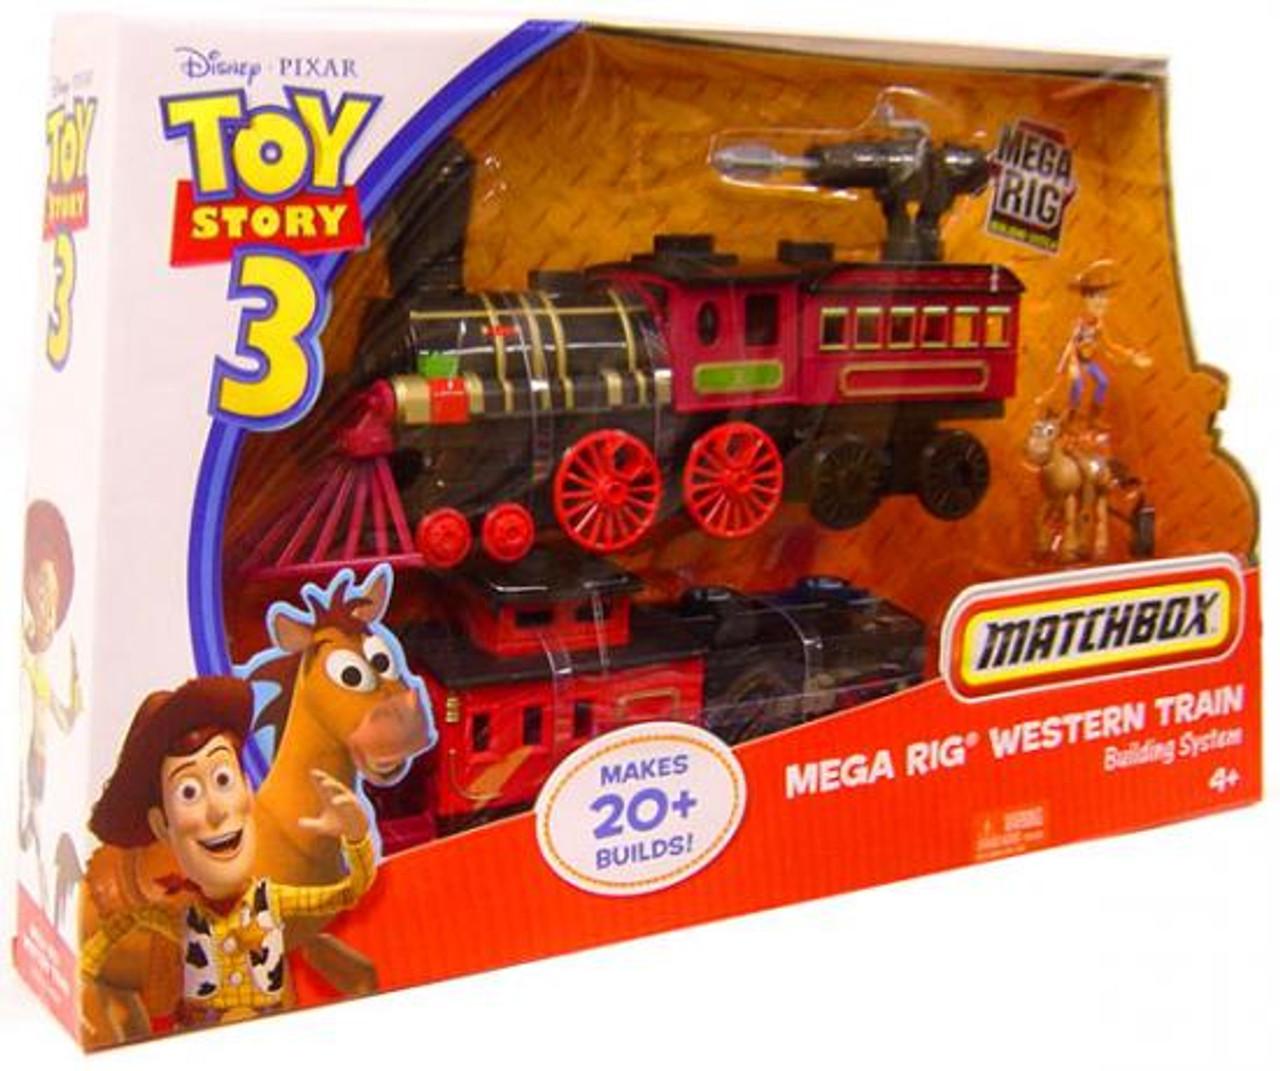 Toy Story 3 Matchbox Mega Rig Western Train